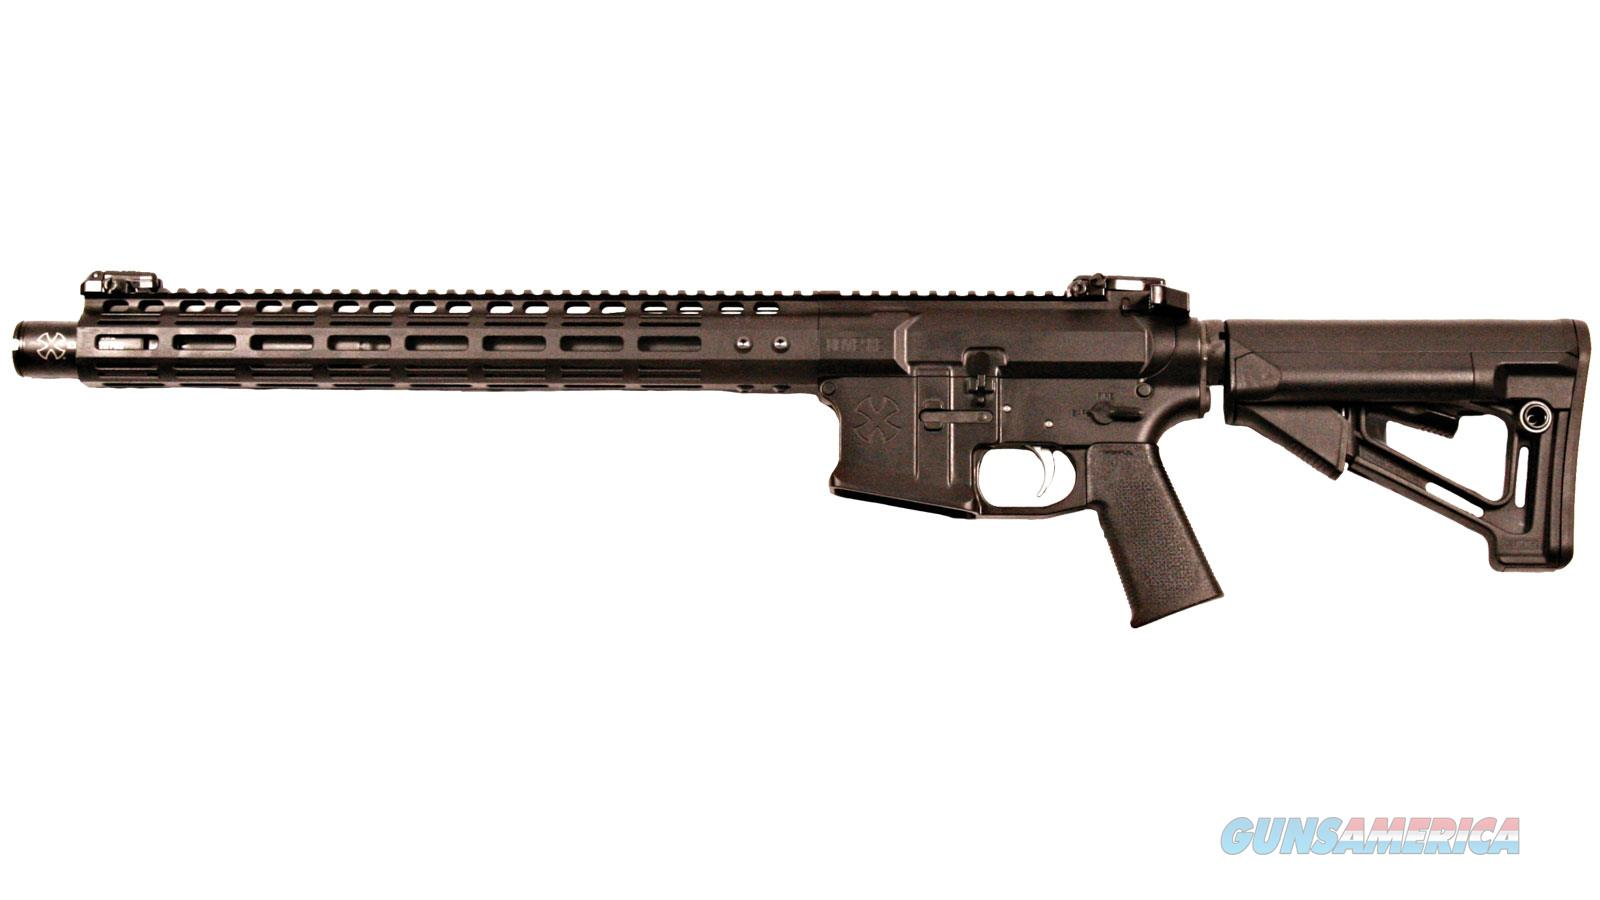 "Noveske Rifleworks Llc Gen3 Infidel 5.56Mm 30Rd 13.7"" Pinned M-Lok Black 02000420  Guns > Rifles > MN Misc Rifles"